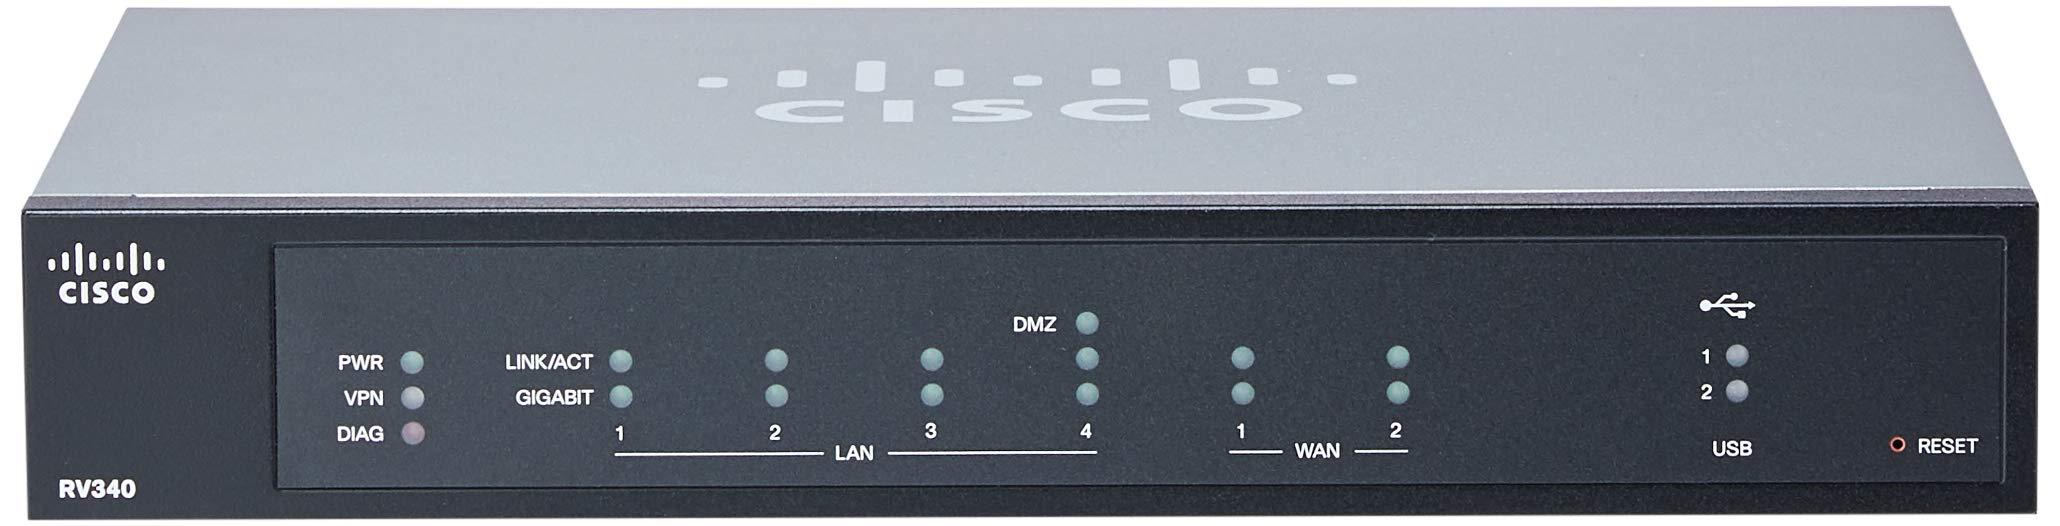 Cisco RV340-K9-NA Dual WAN Gigabit Router by Cisco Systems